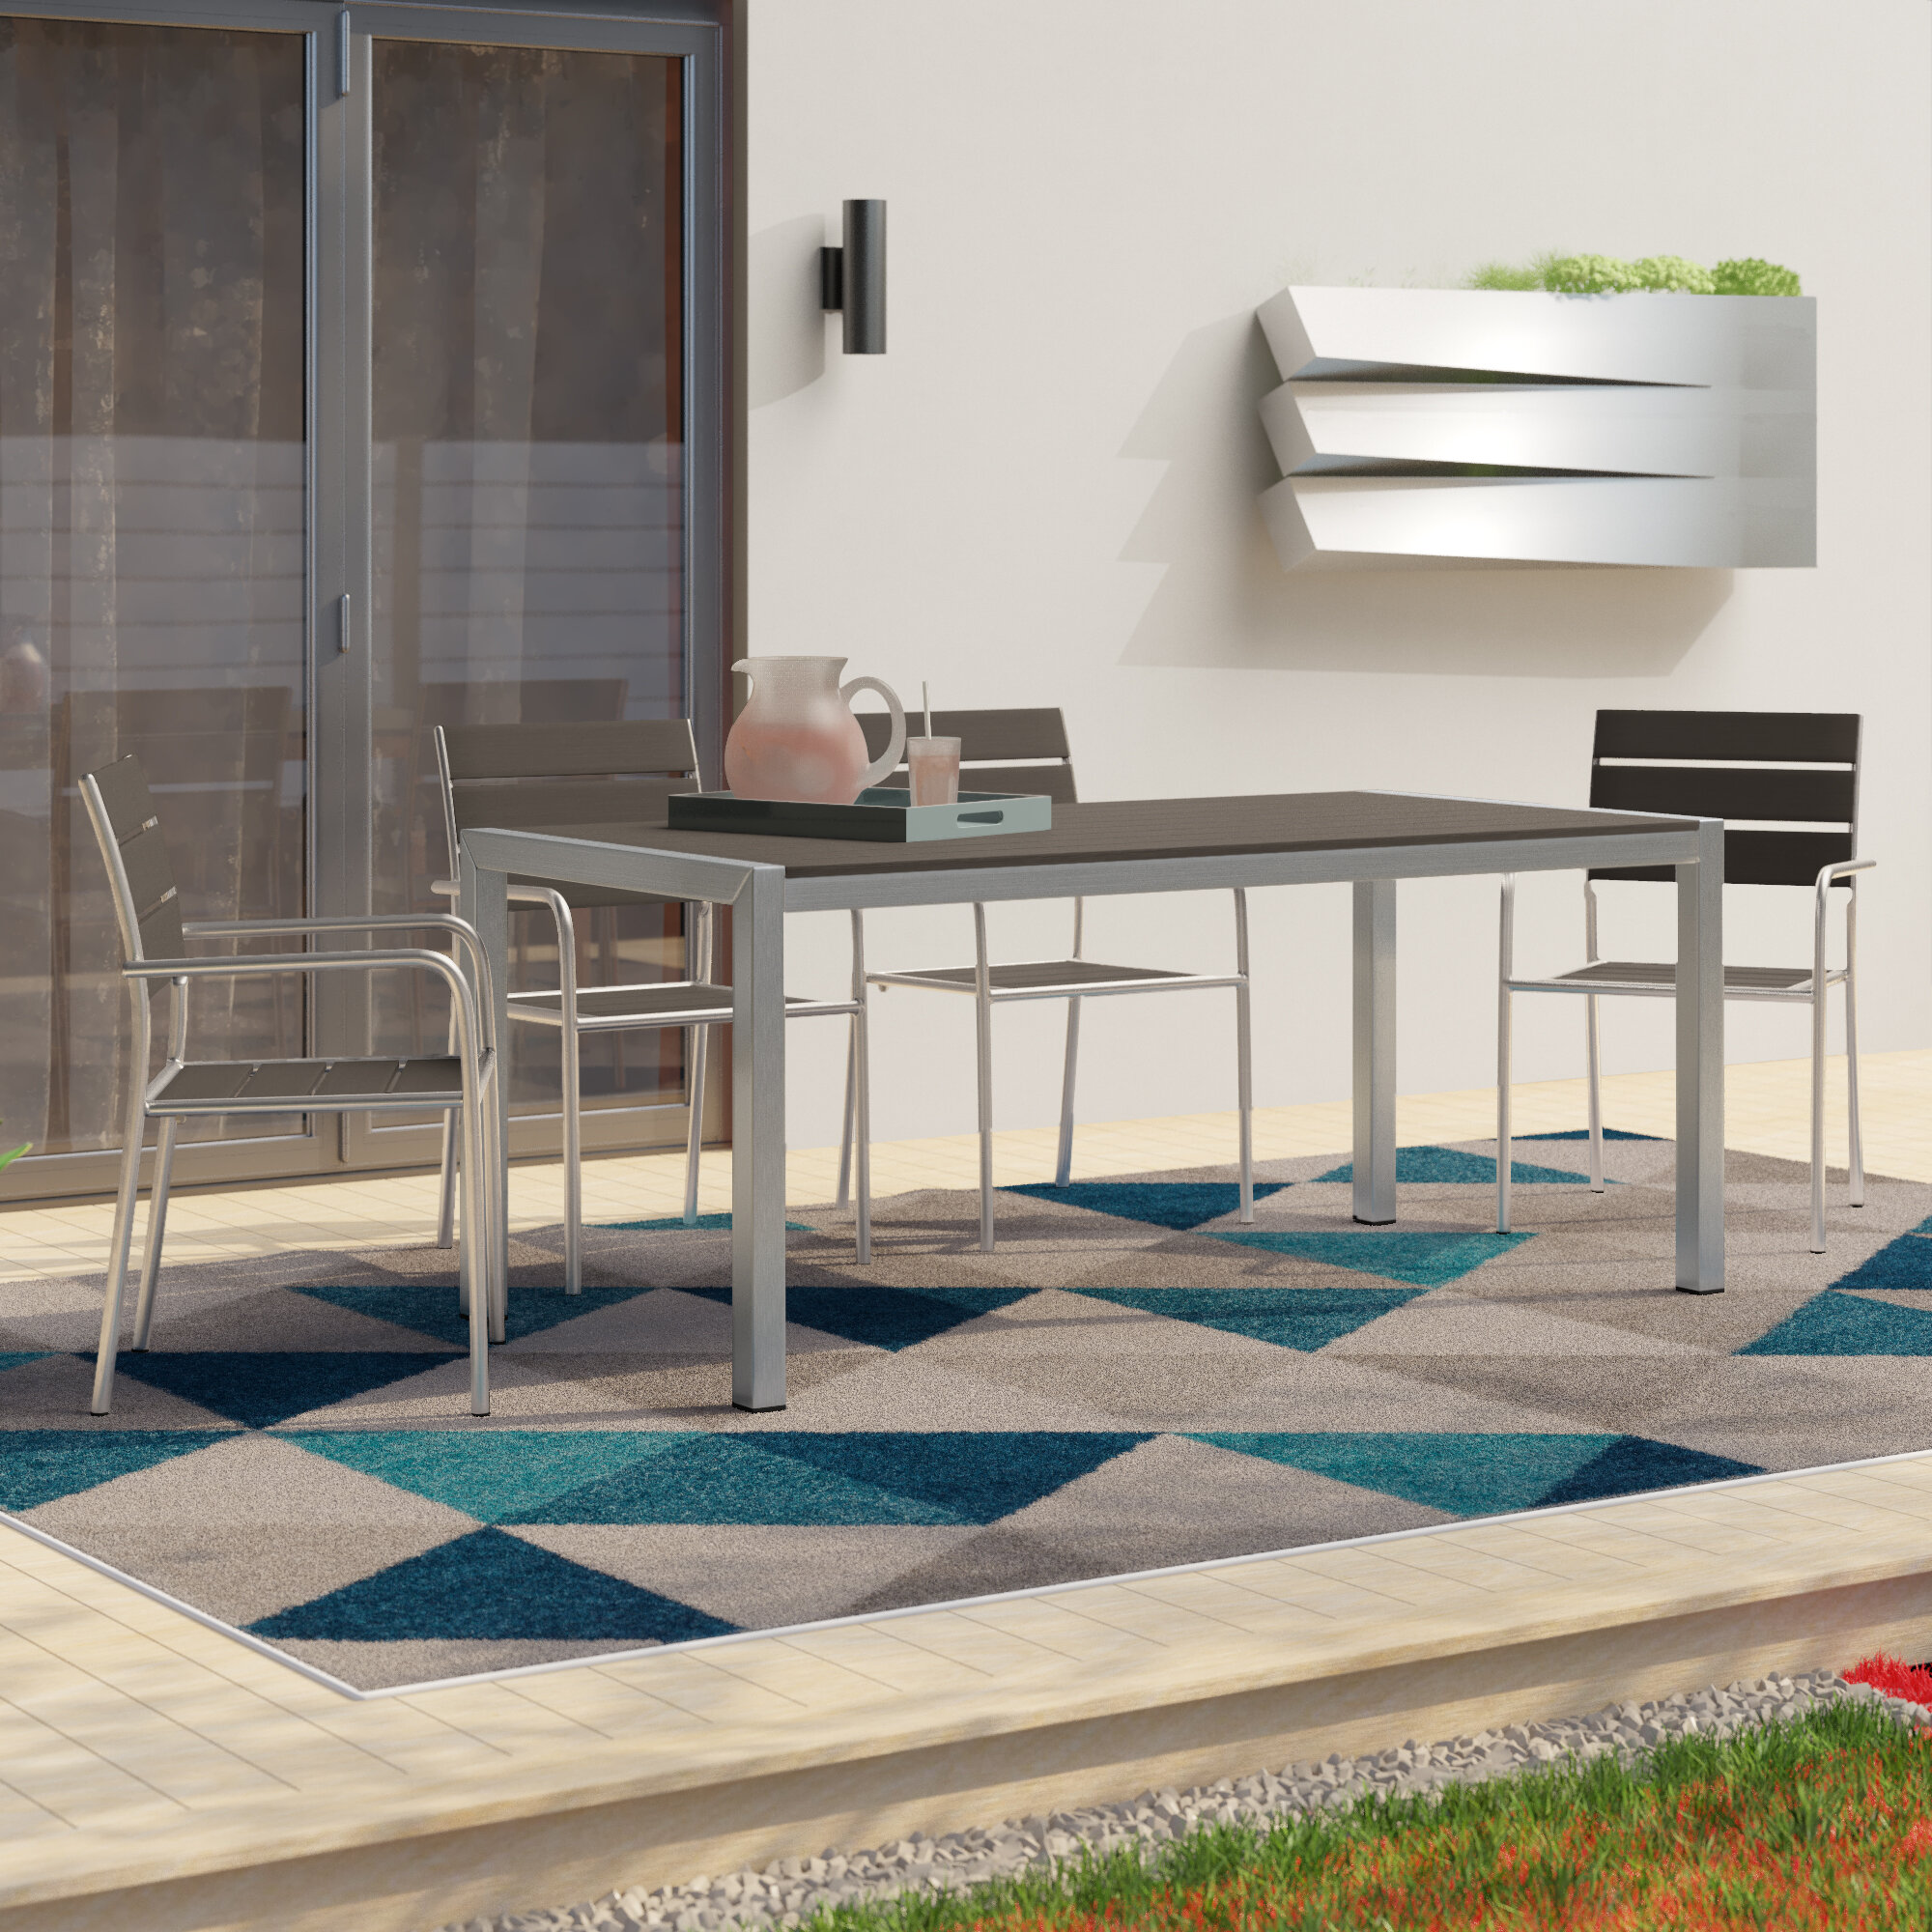 Orren Ellis Coline Outdoor Rectangular Patio Aluminum 5 Piece Dining Set Wayfair